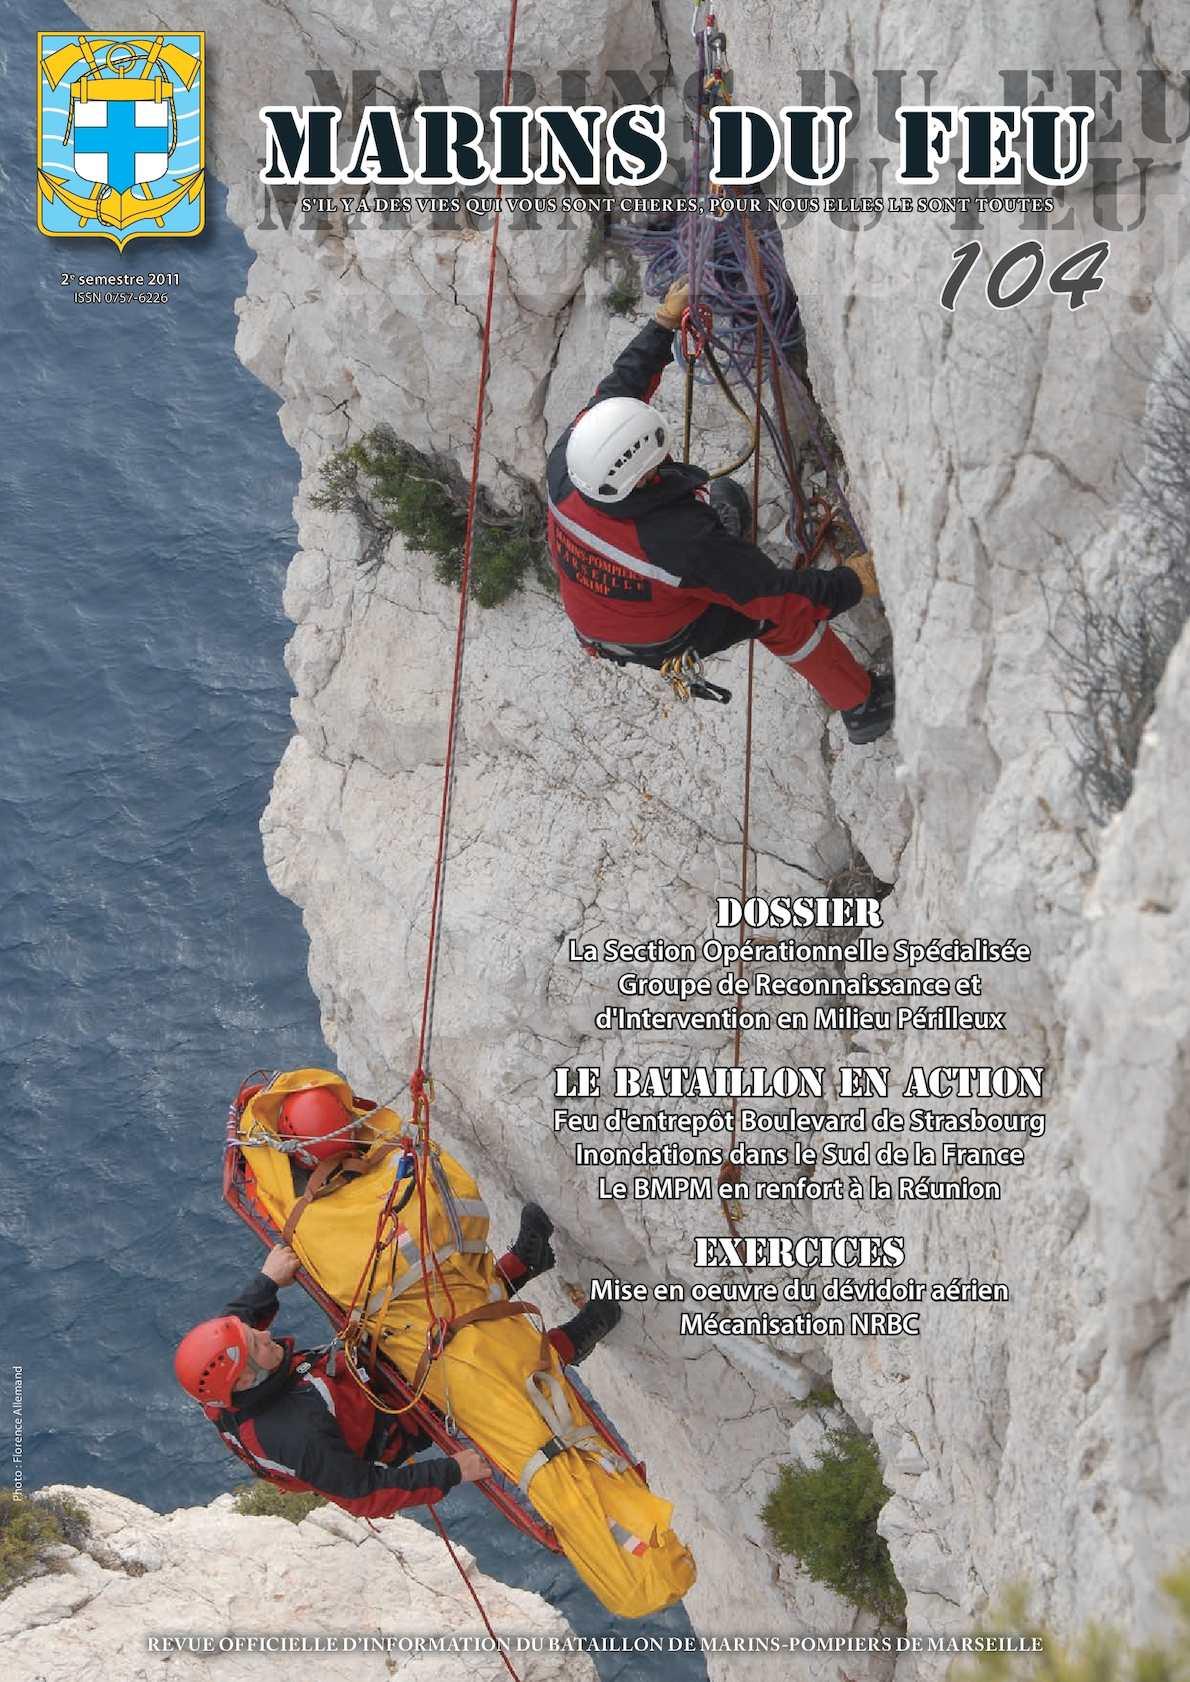 Marins du feu N°104 (mars 2012) Marins-pompiers de Marseille